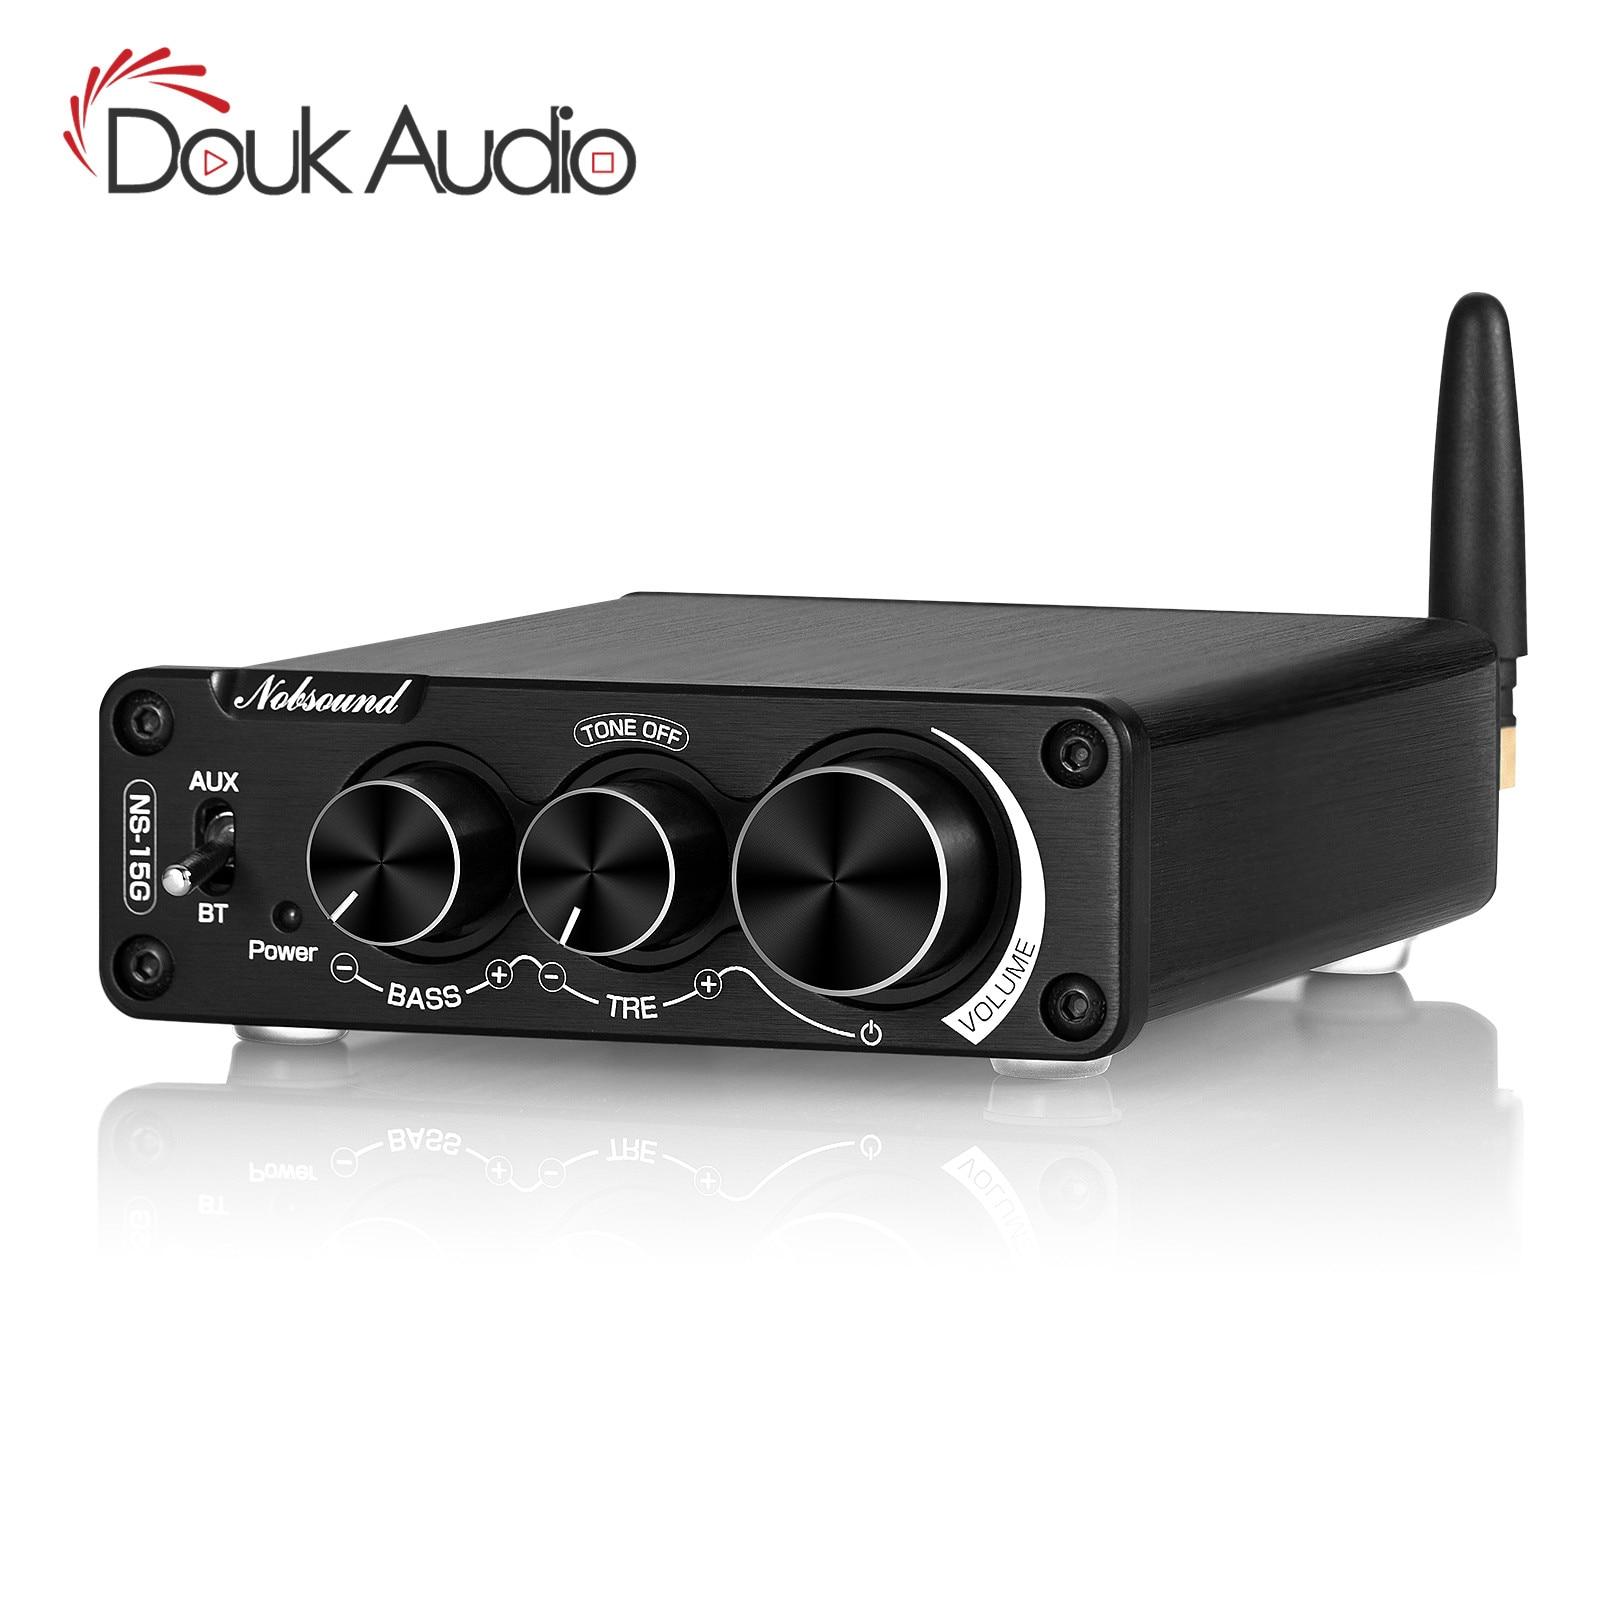 Nobsound Mini TPA3116 Dijital ses amplifikatörü HiFi Bluetooth 5.0 D Sınıfı Stereo Güç Amplifikatörü 100W * 2